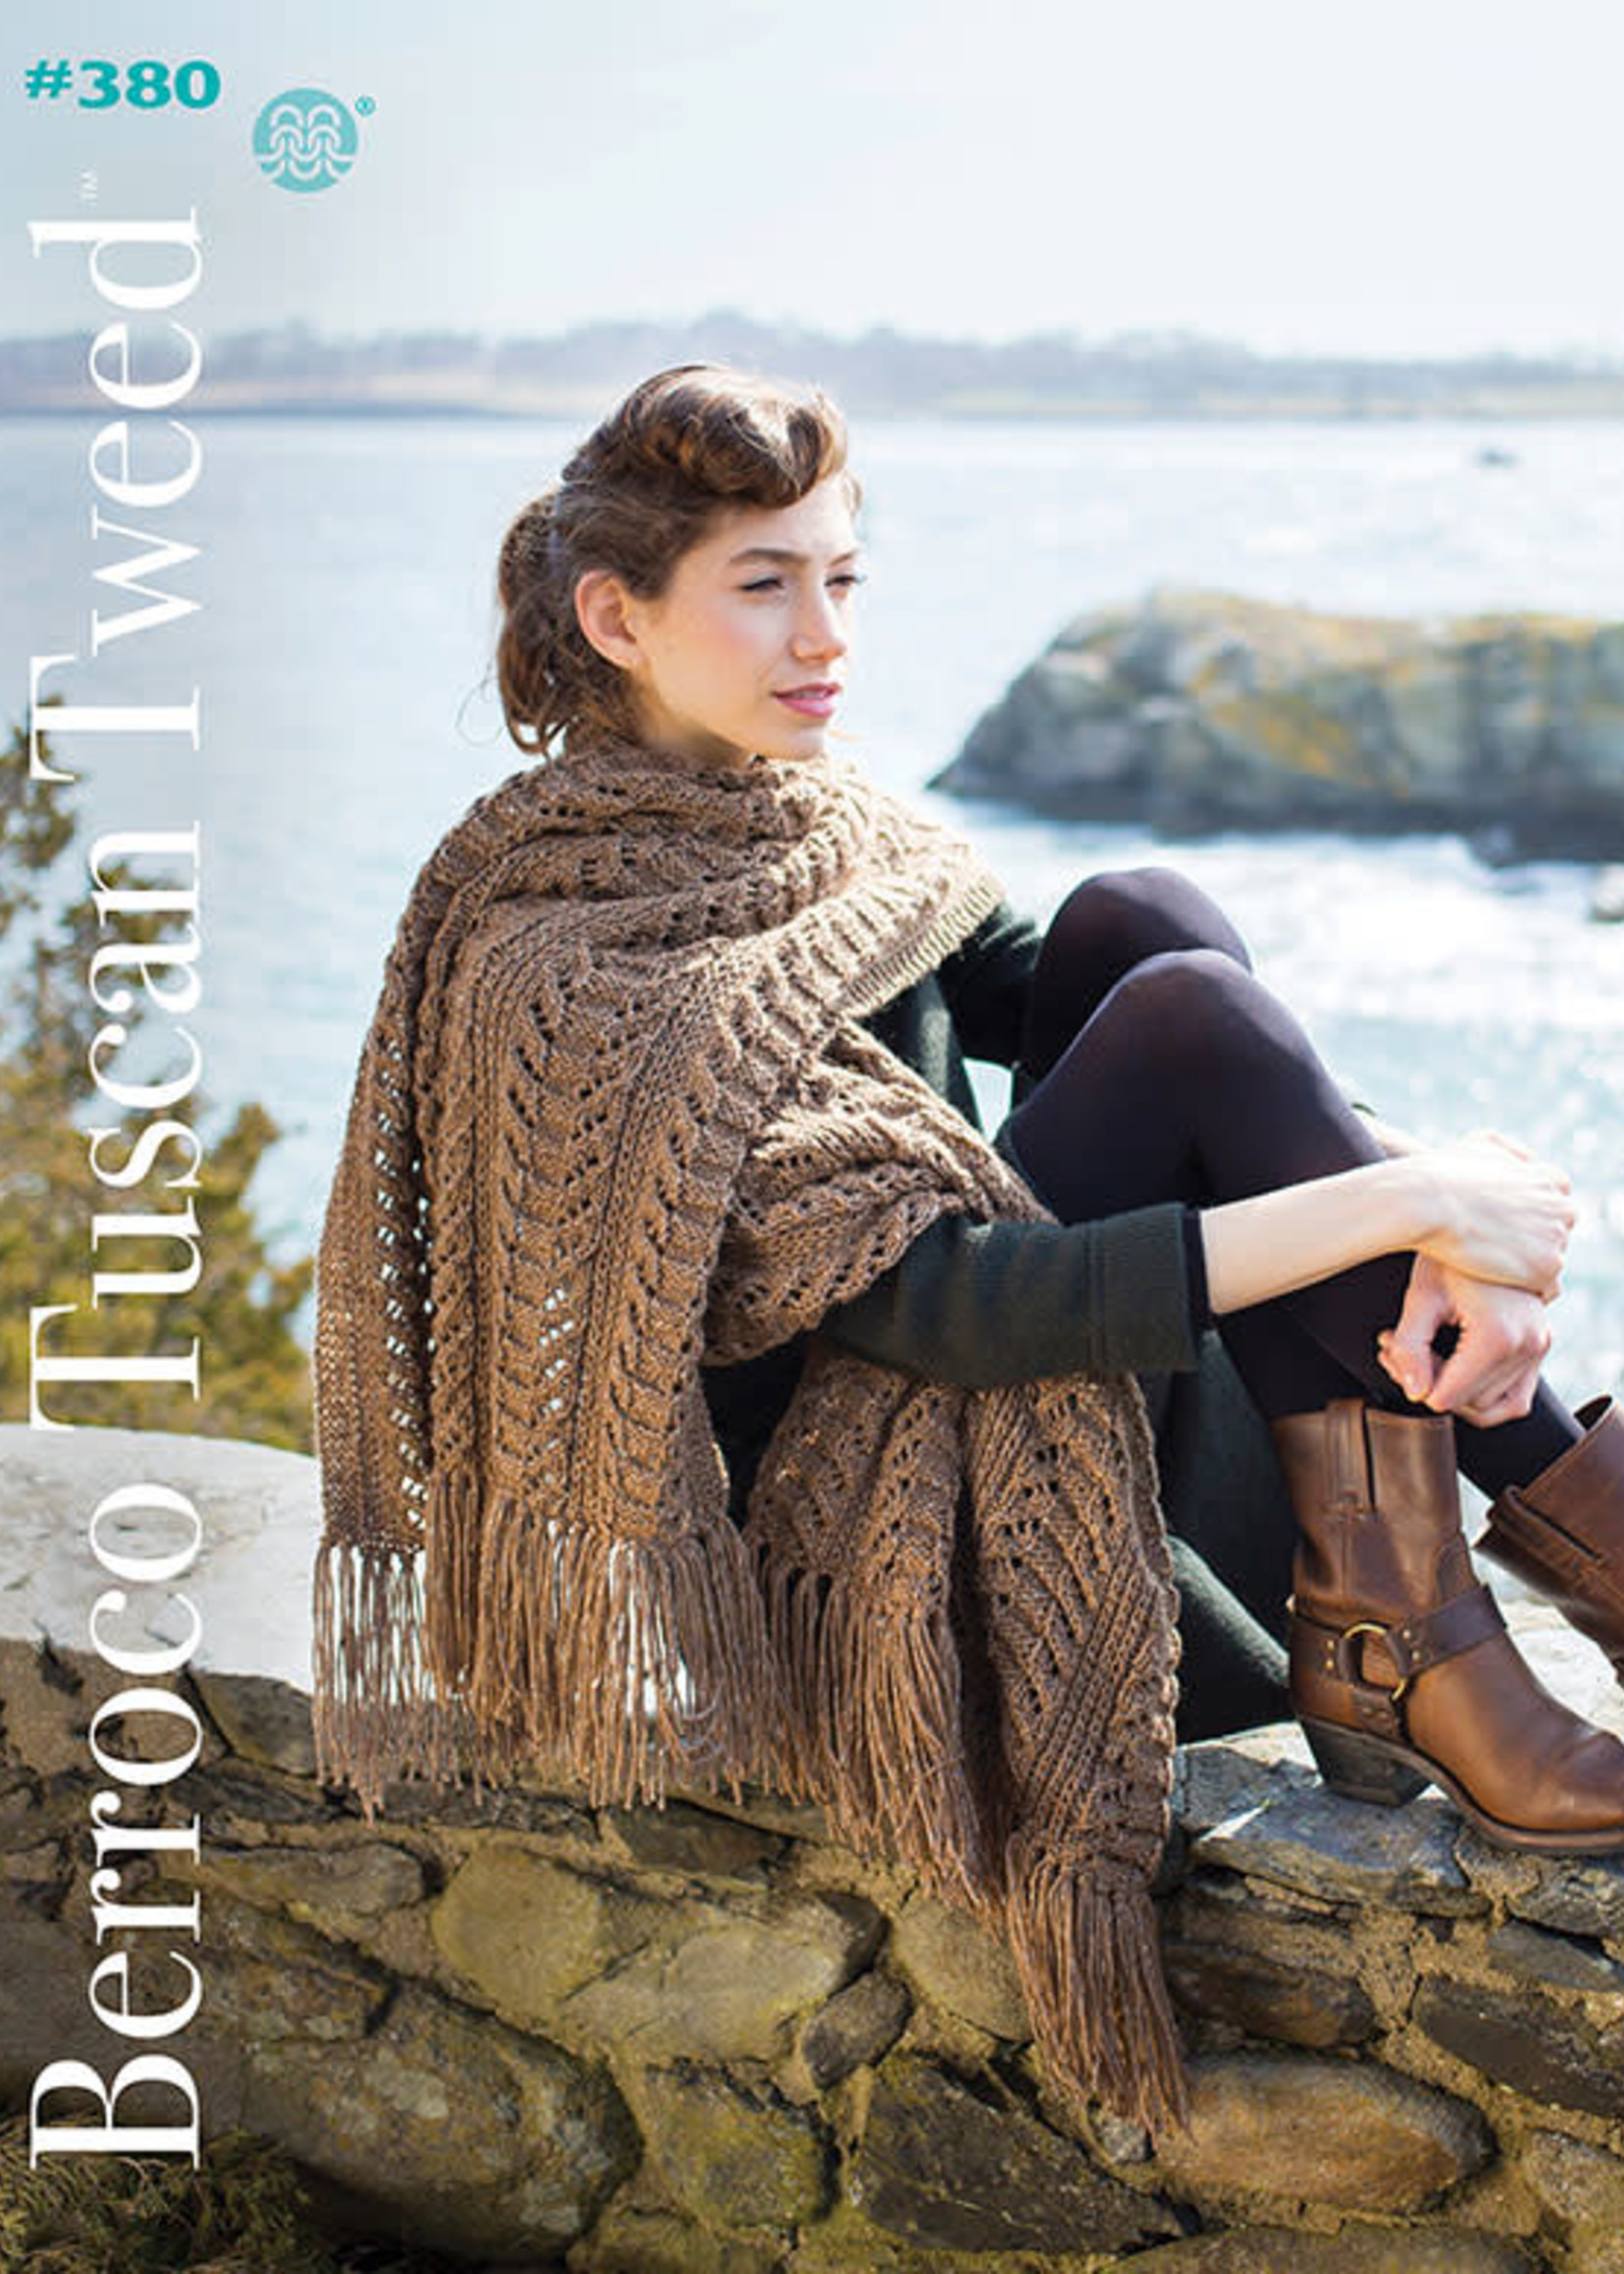 Berroco Tuscan Tweed Booklet #380